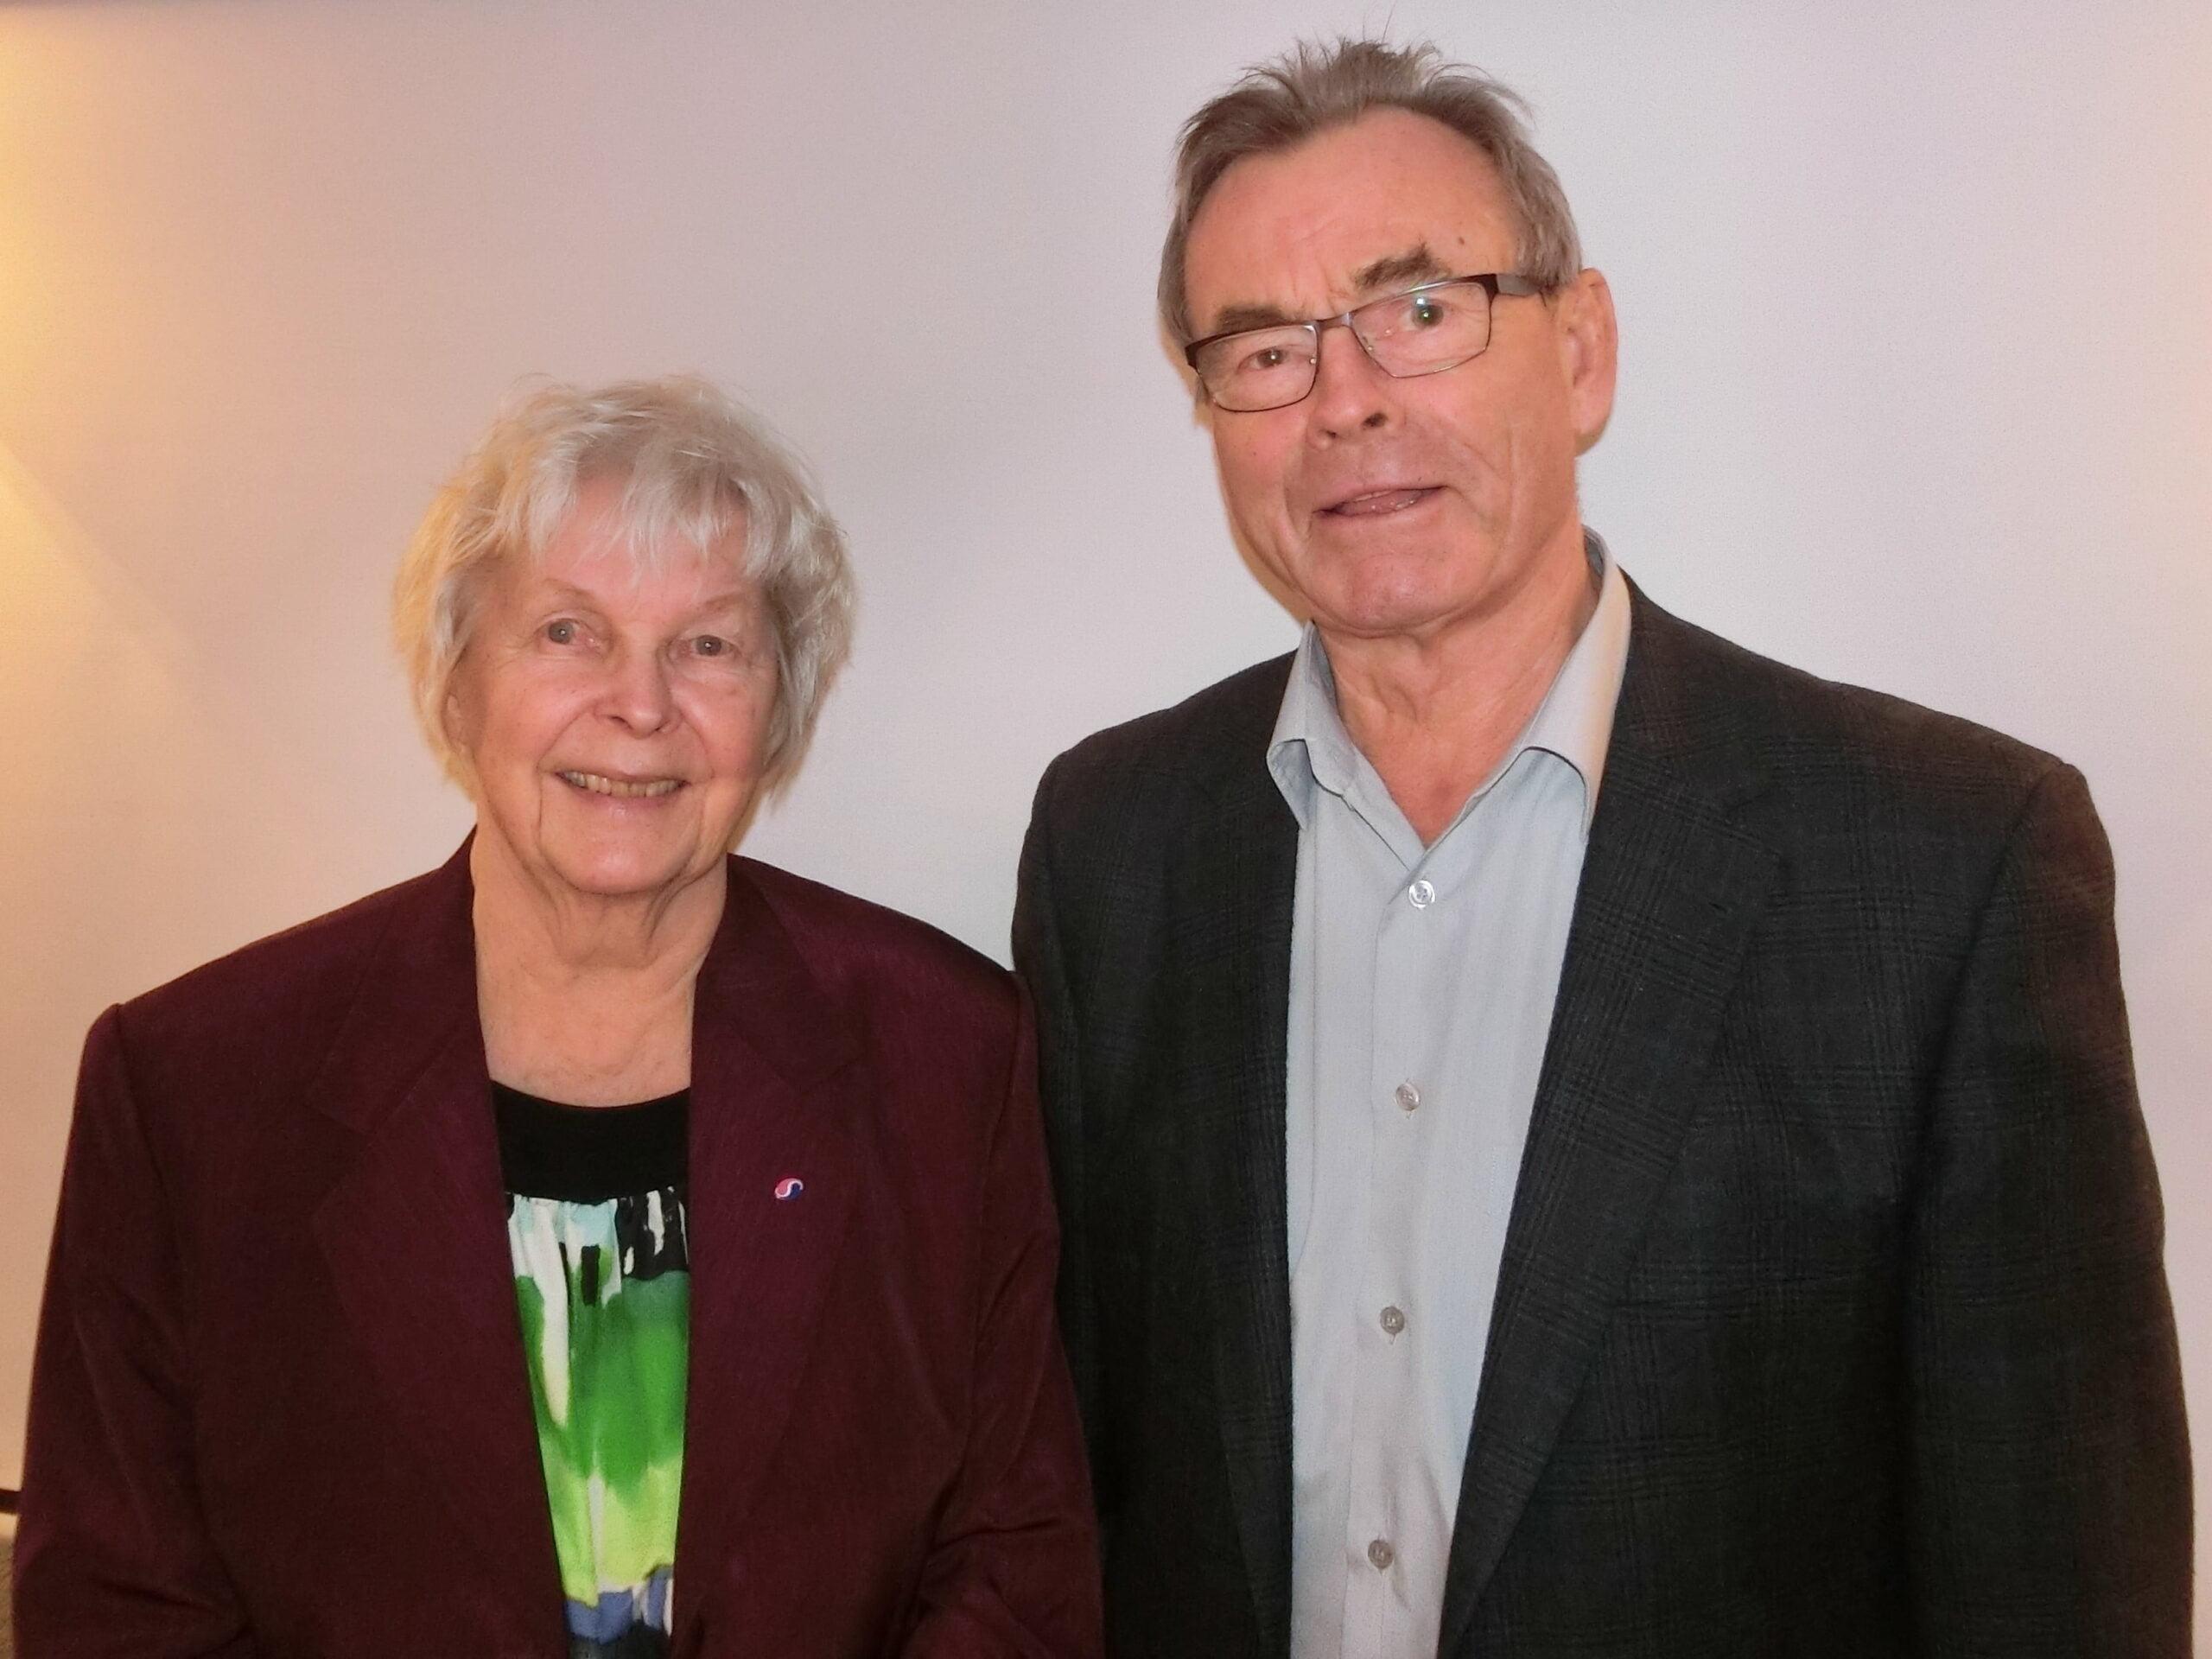 Audhild Freberg Iversen og Per Nygaard-Østby